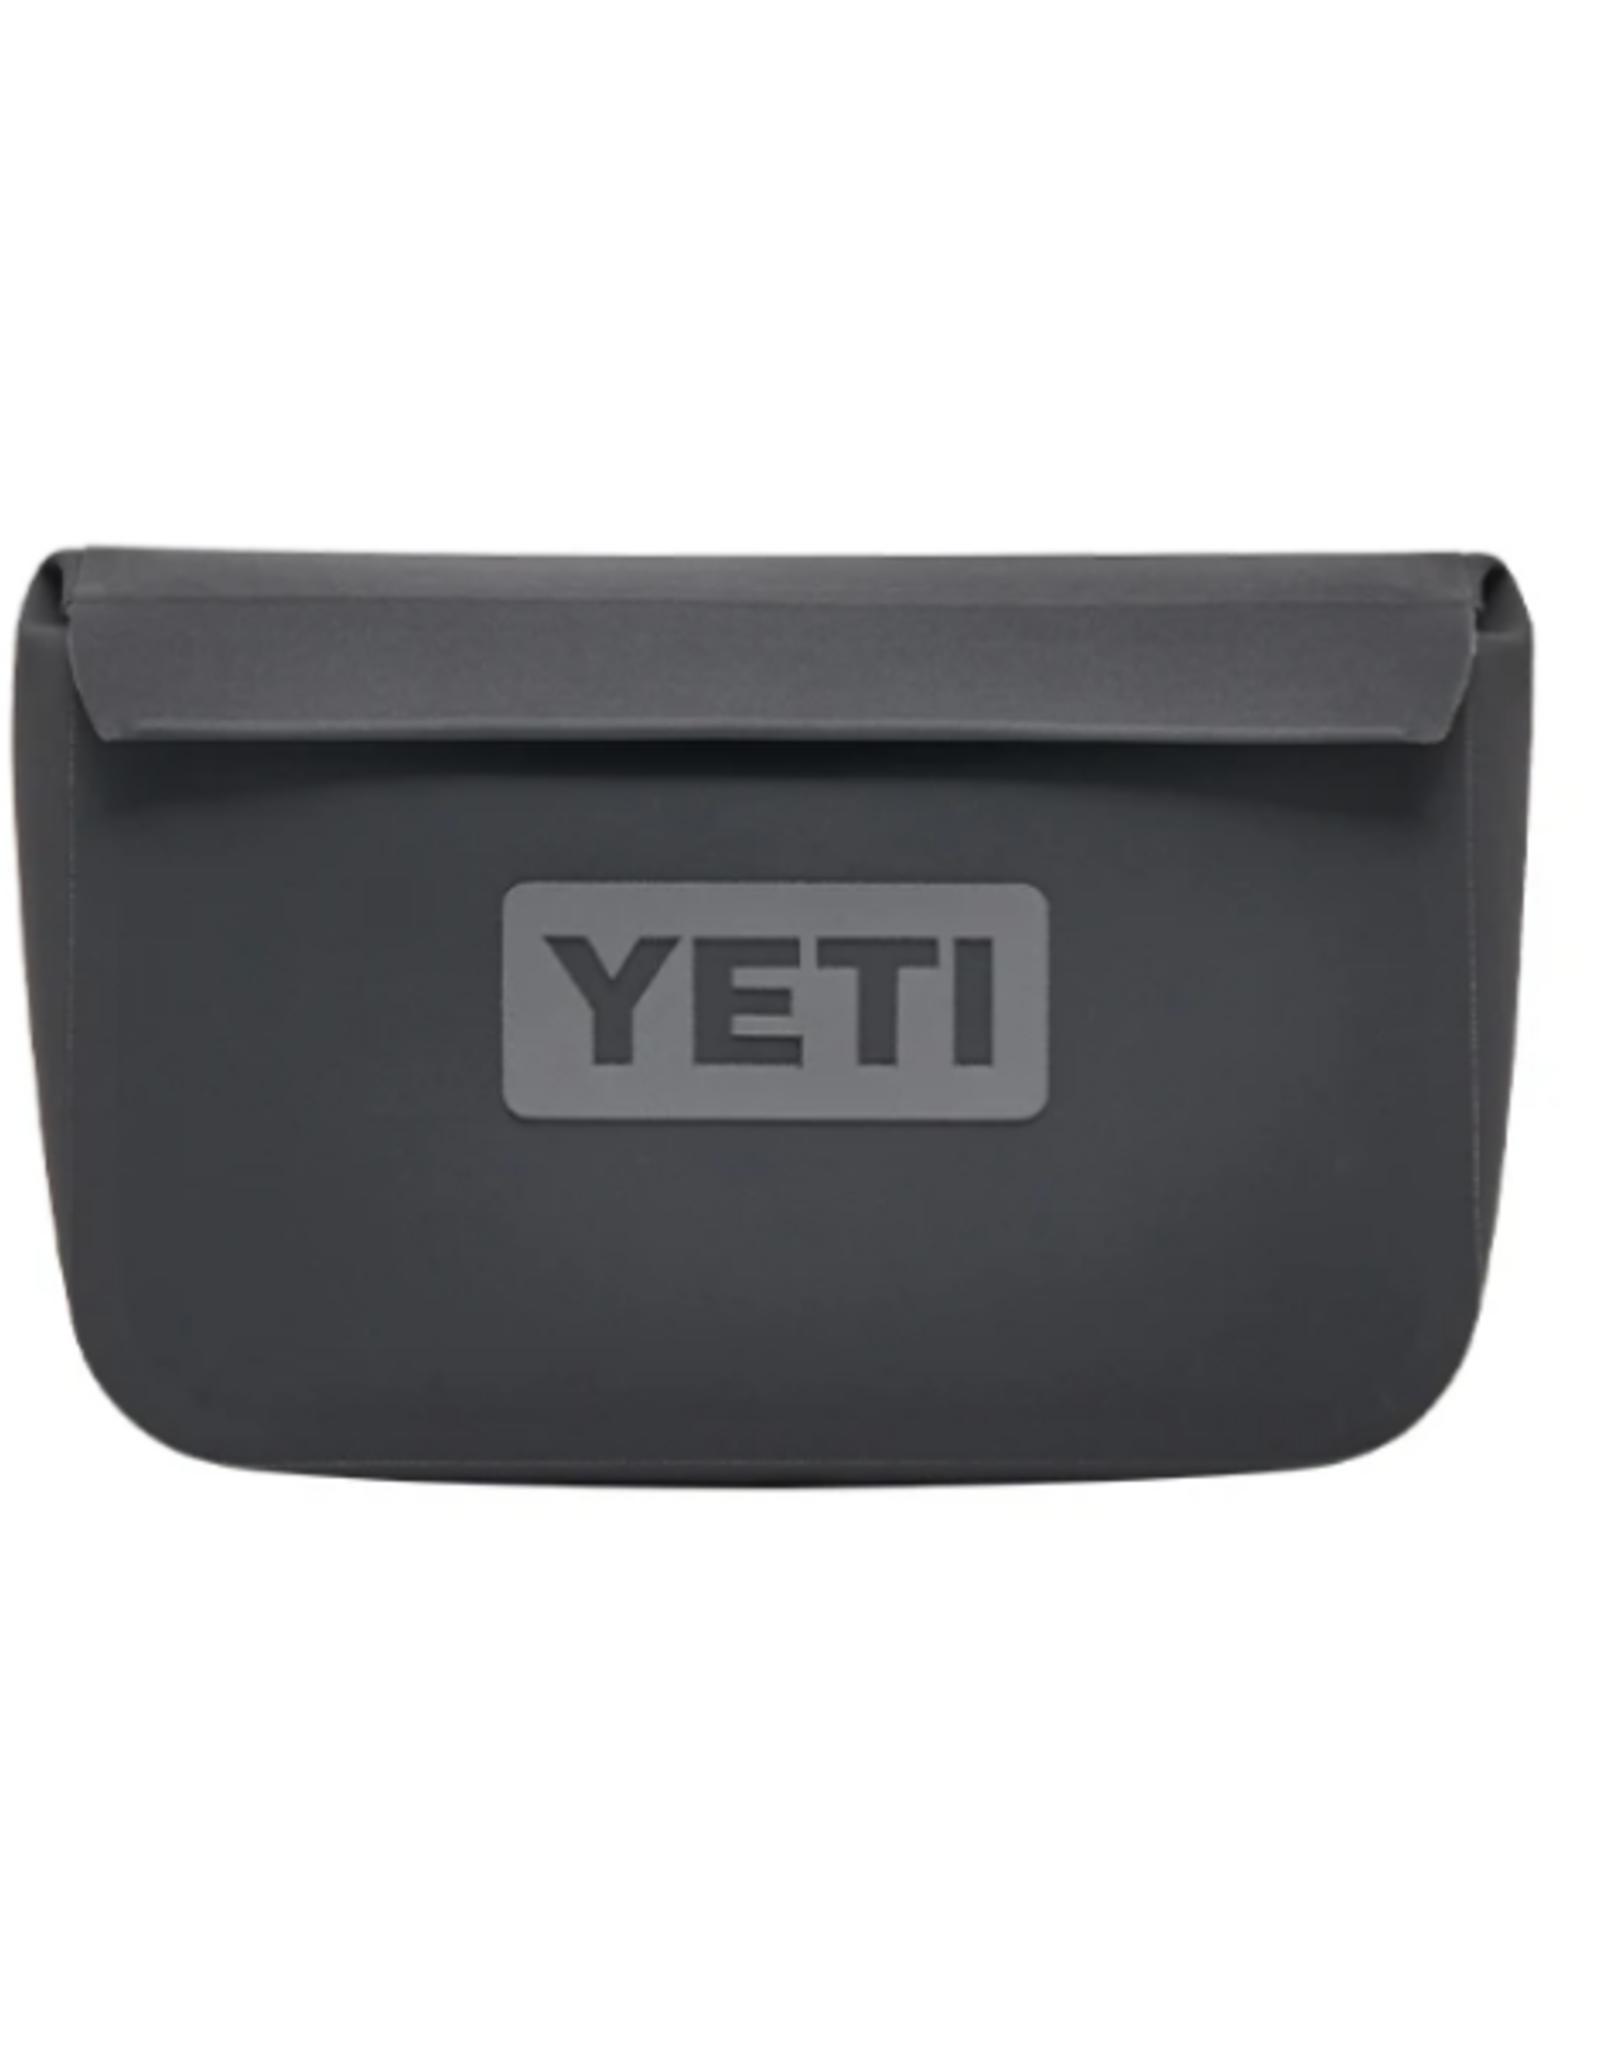 Yeti Sidekick Dry Gear Case Charcoal